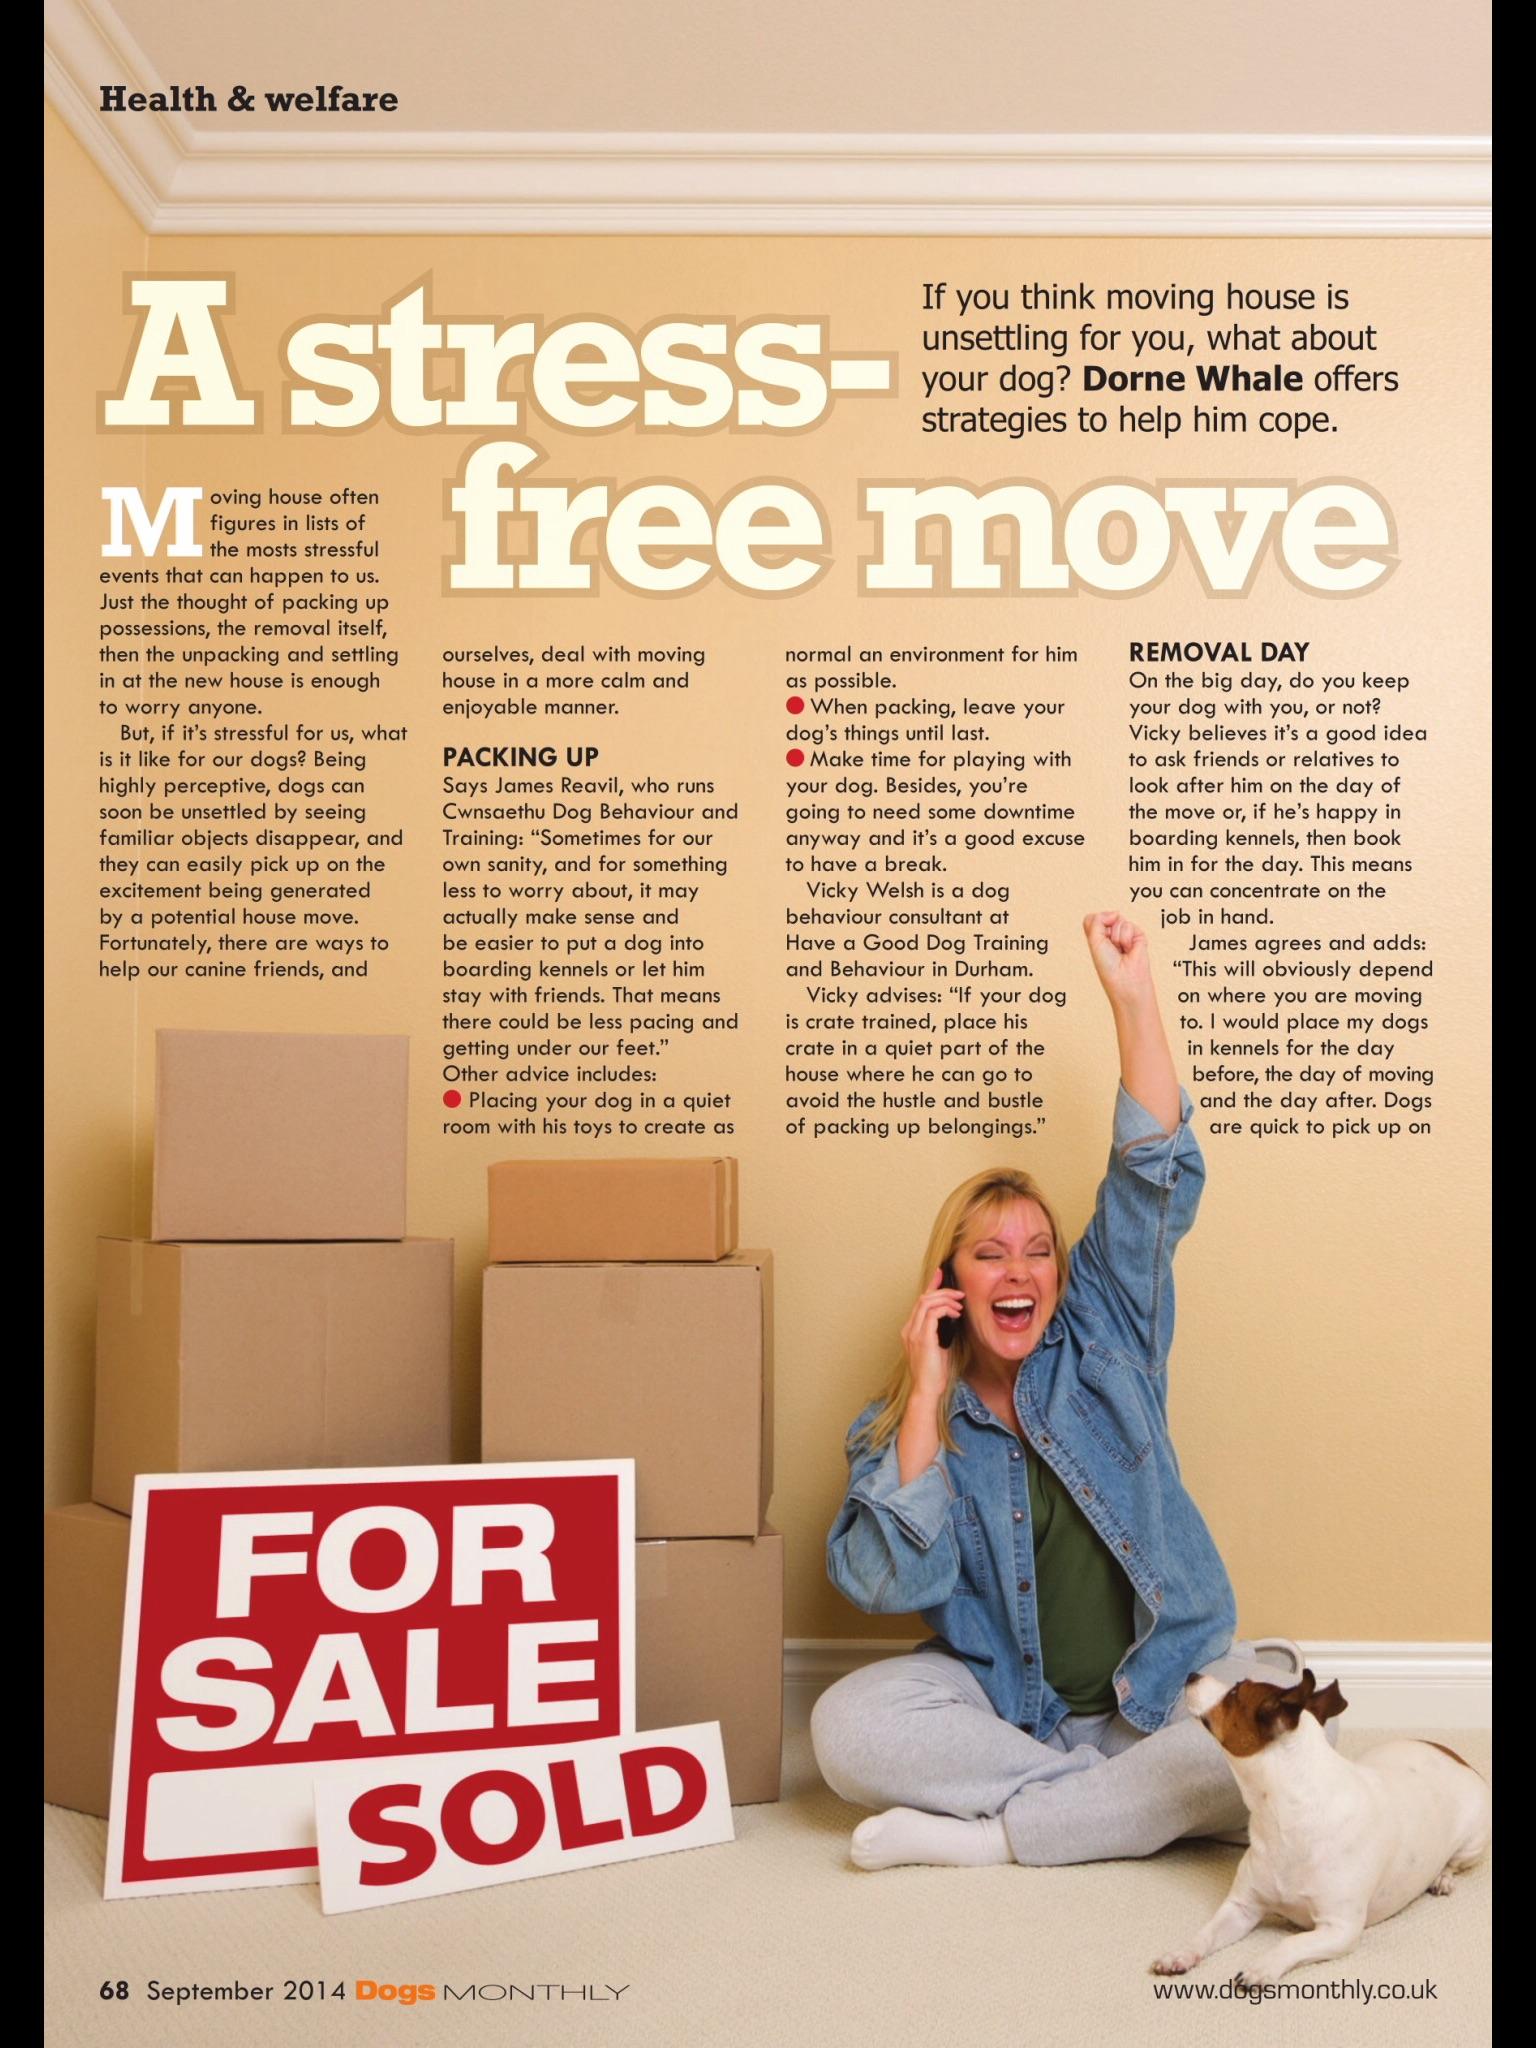 Dogs monthly Magazine September 2014